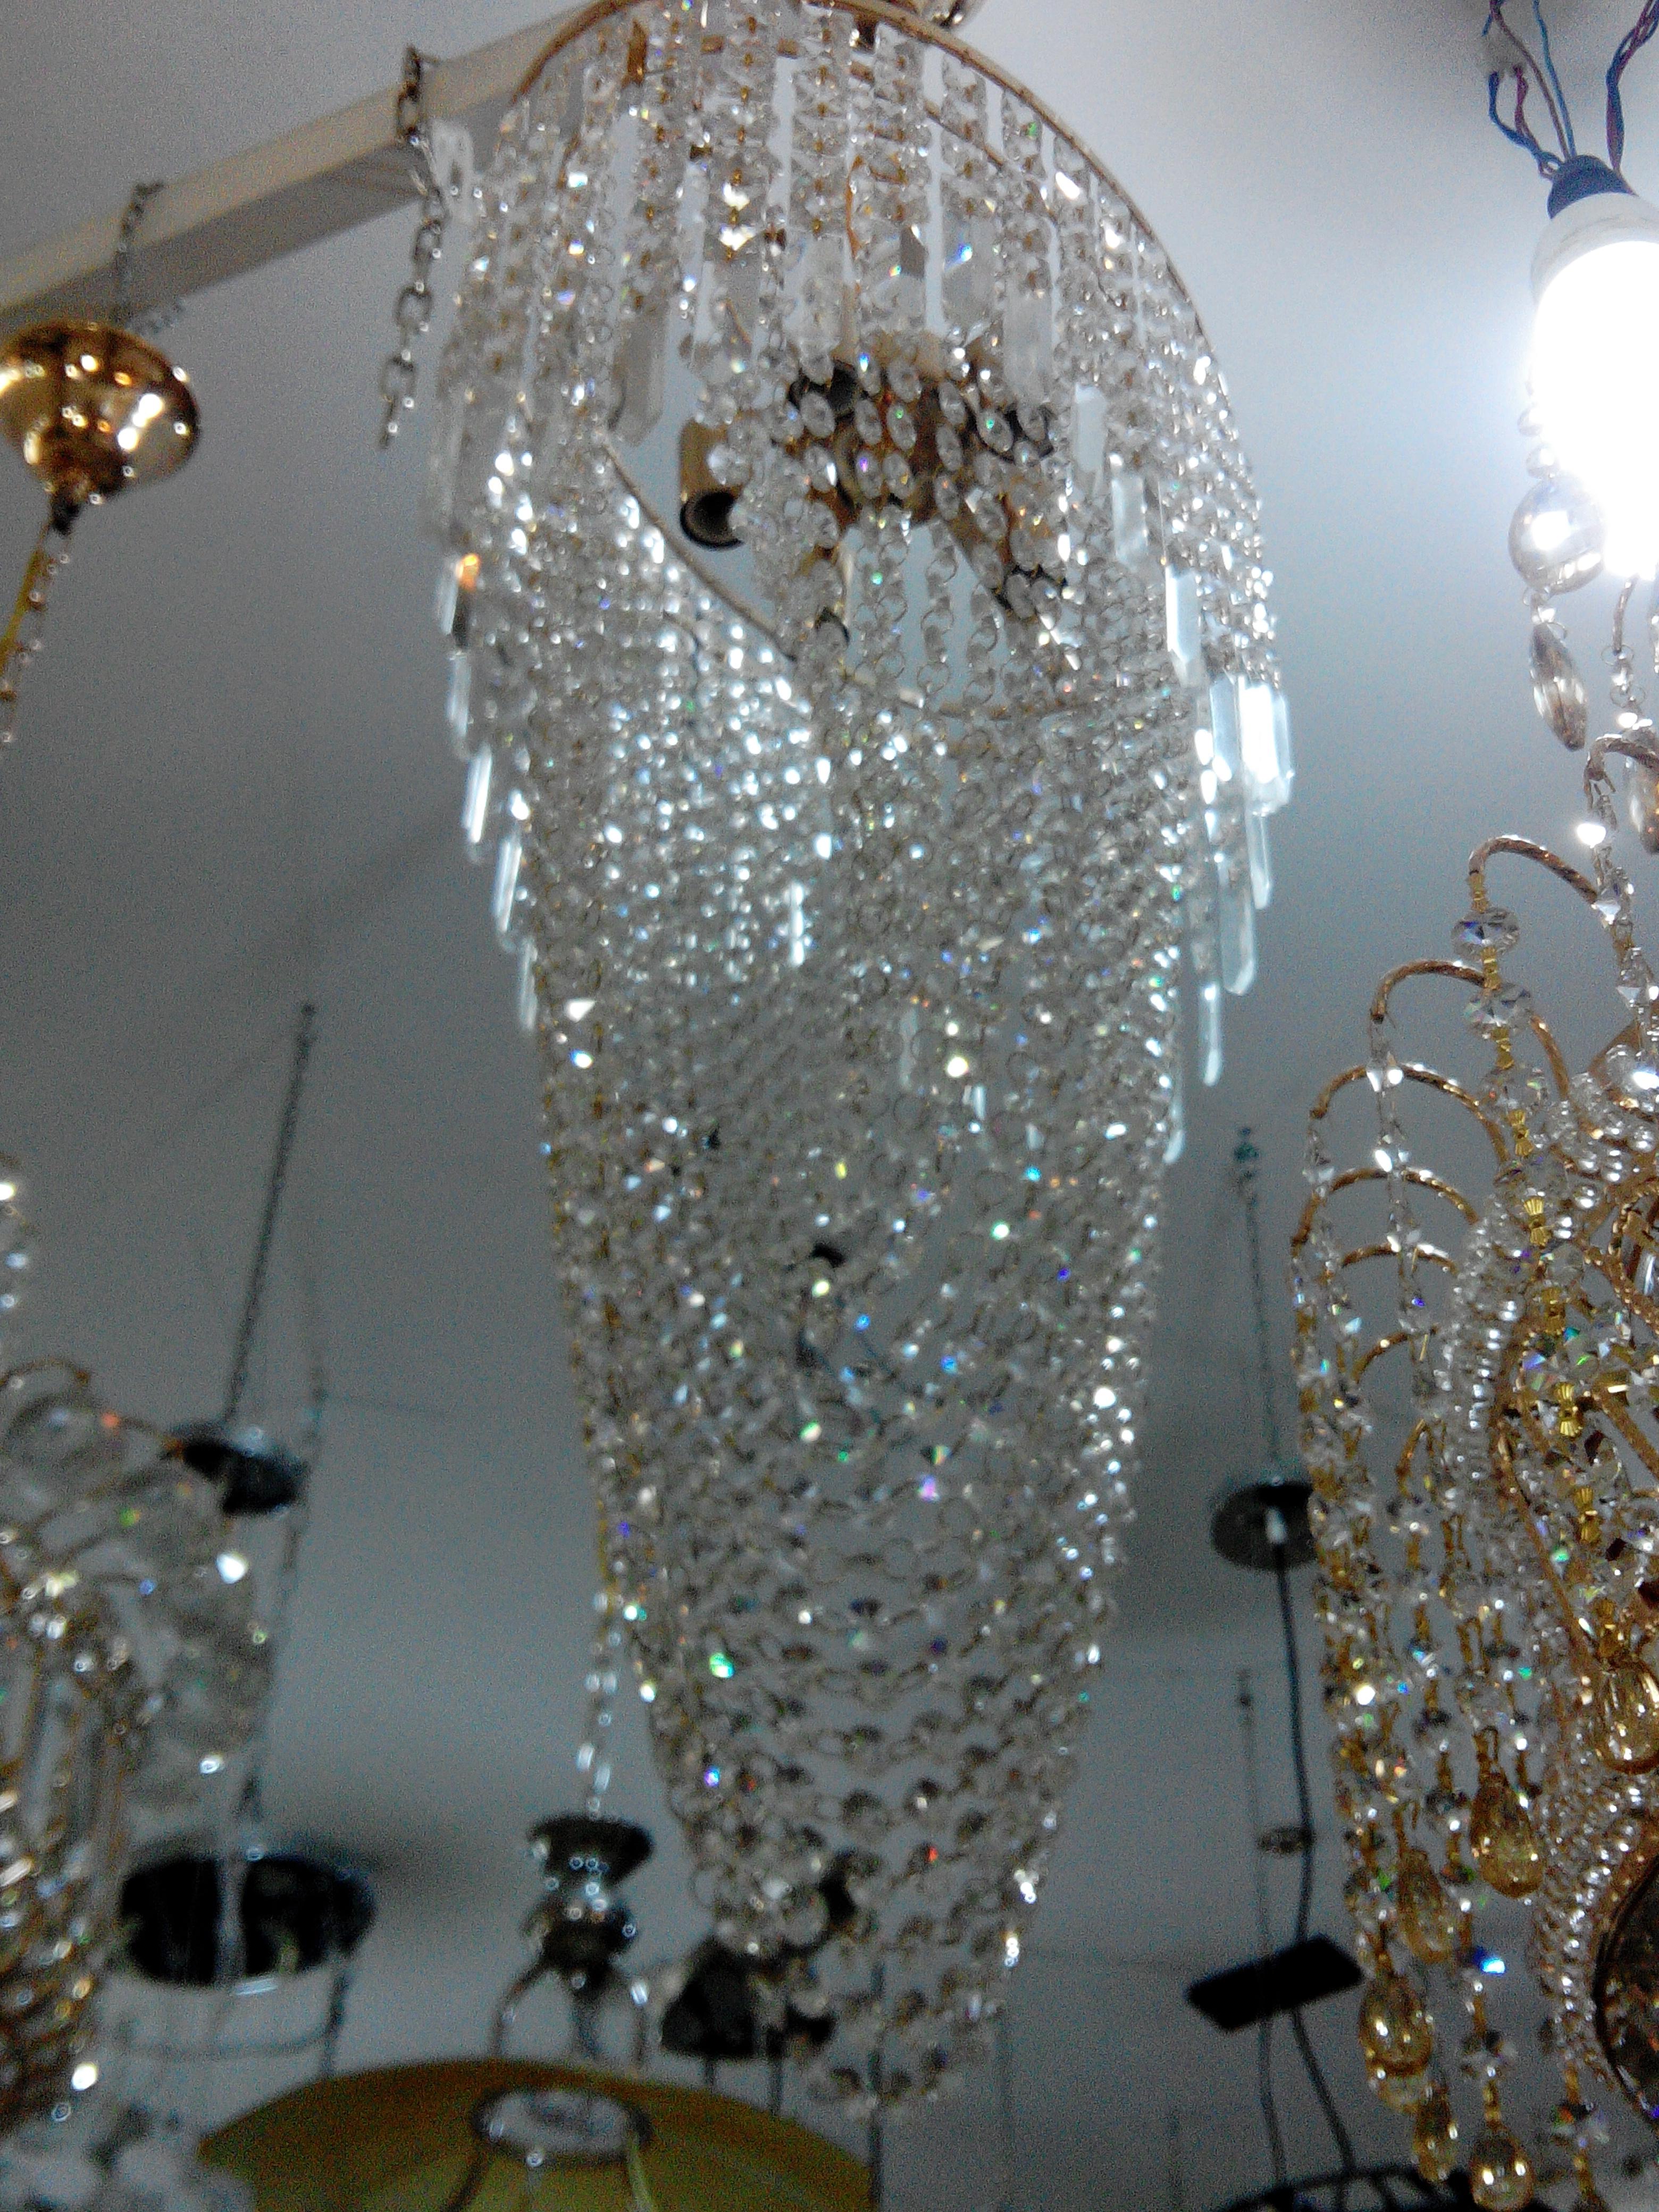 Meuble salon tunisie: chambre baroque contemporain: idees deco ...